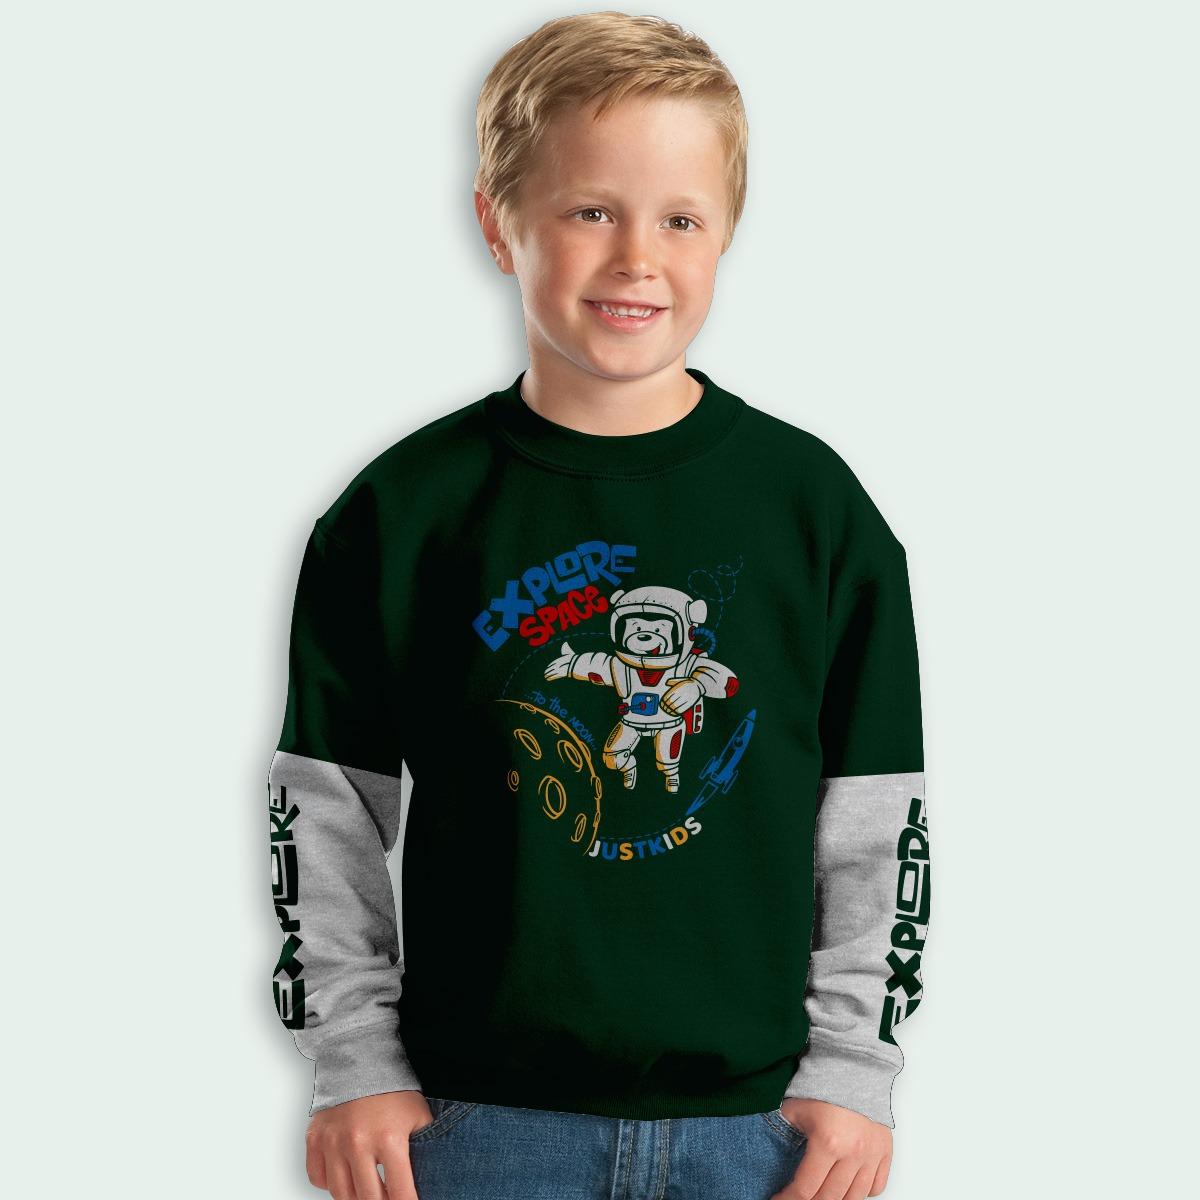 SWEETER PJG JUST KIDS (EXPLORE) (ANKL00019)